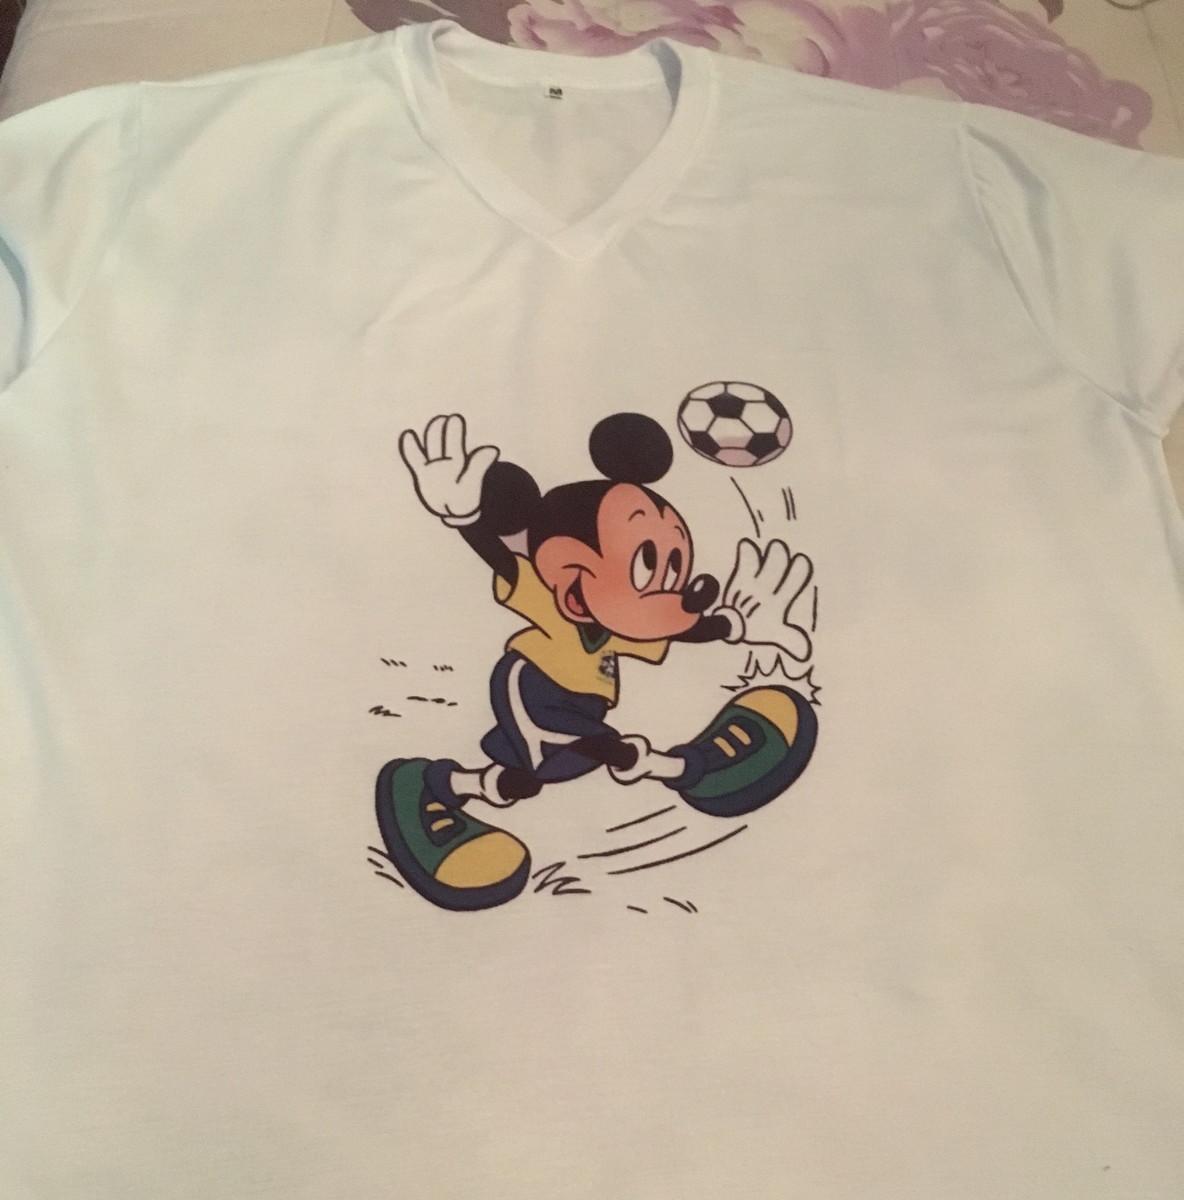 30cac441cd Camiseta Personalizada Mickey Futebol no Elo7